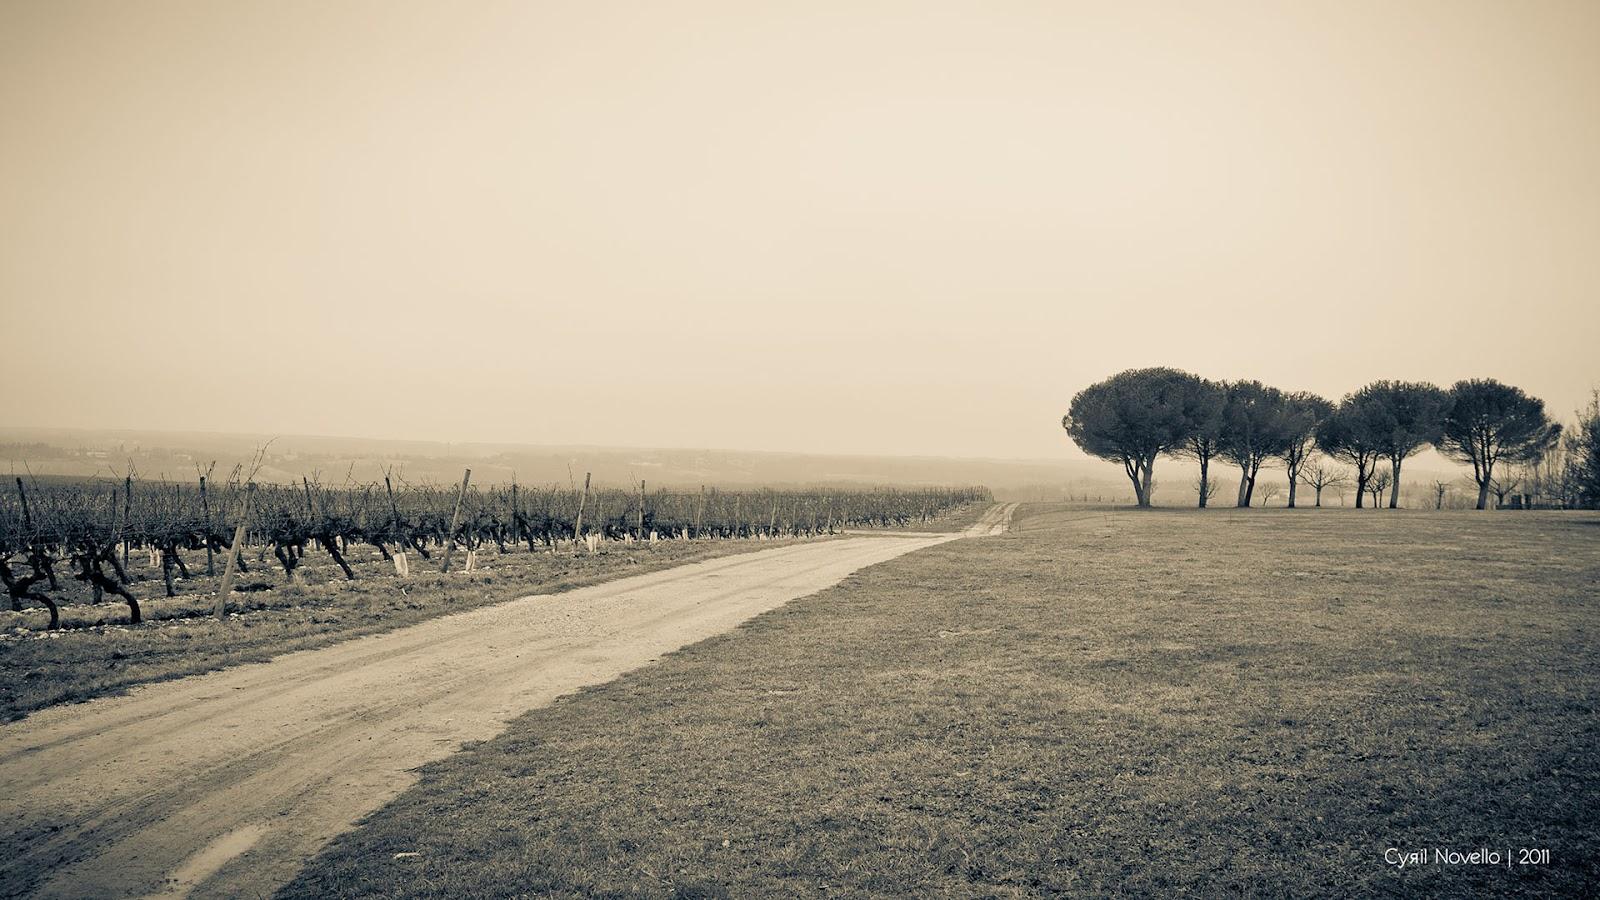 http://2.bp.blogspot.com/-xn0mFw9tAH4/UGzaVdXku-I/AAAAAAAAGJA/4Wy6uxSl3Ag/s1600/pines_and_vineyards_by_cyrilnovello.jpg